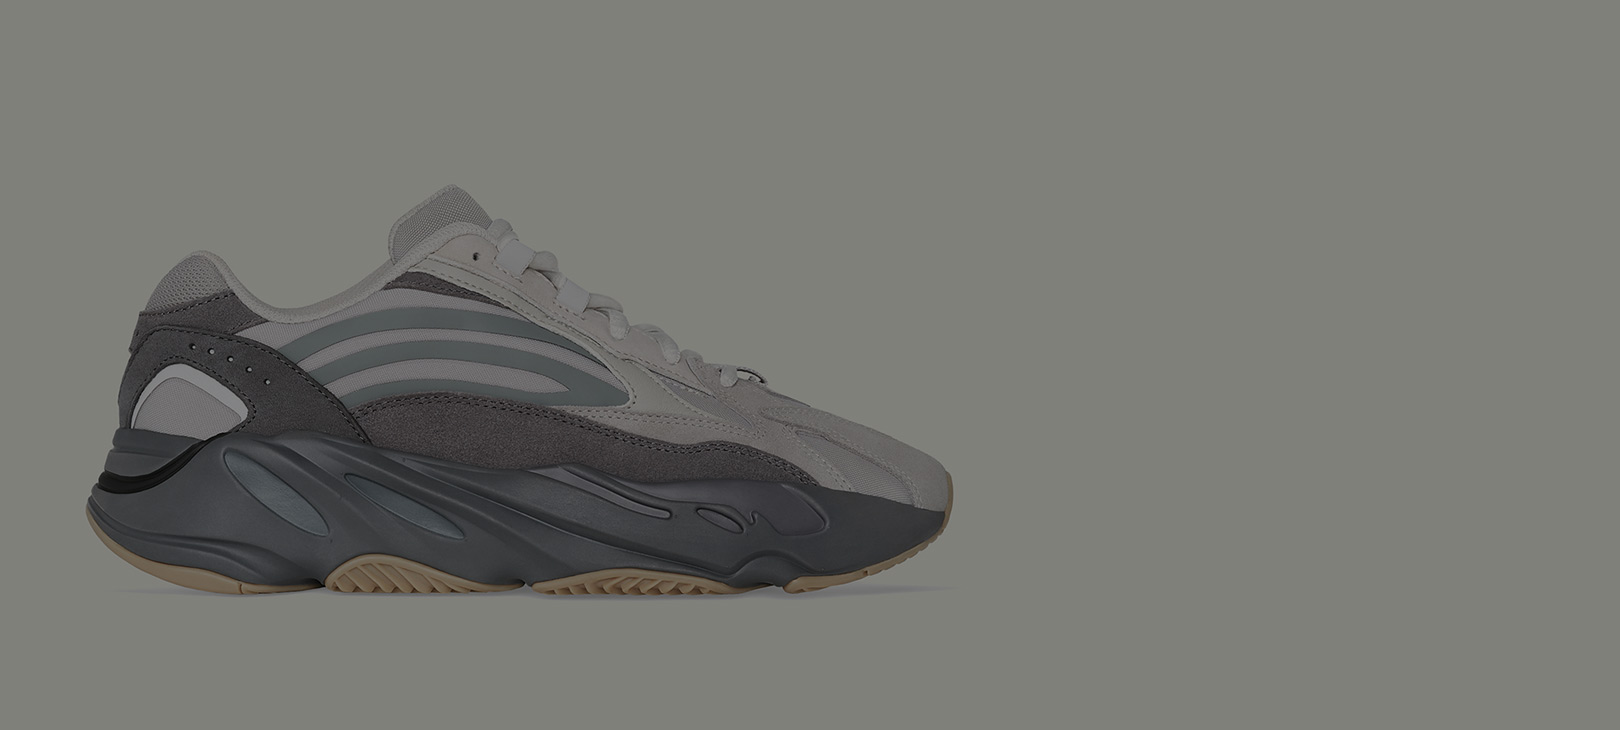 official photos 1285d 9032e Sneaker News - Jordans, release dates & more.